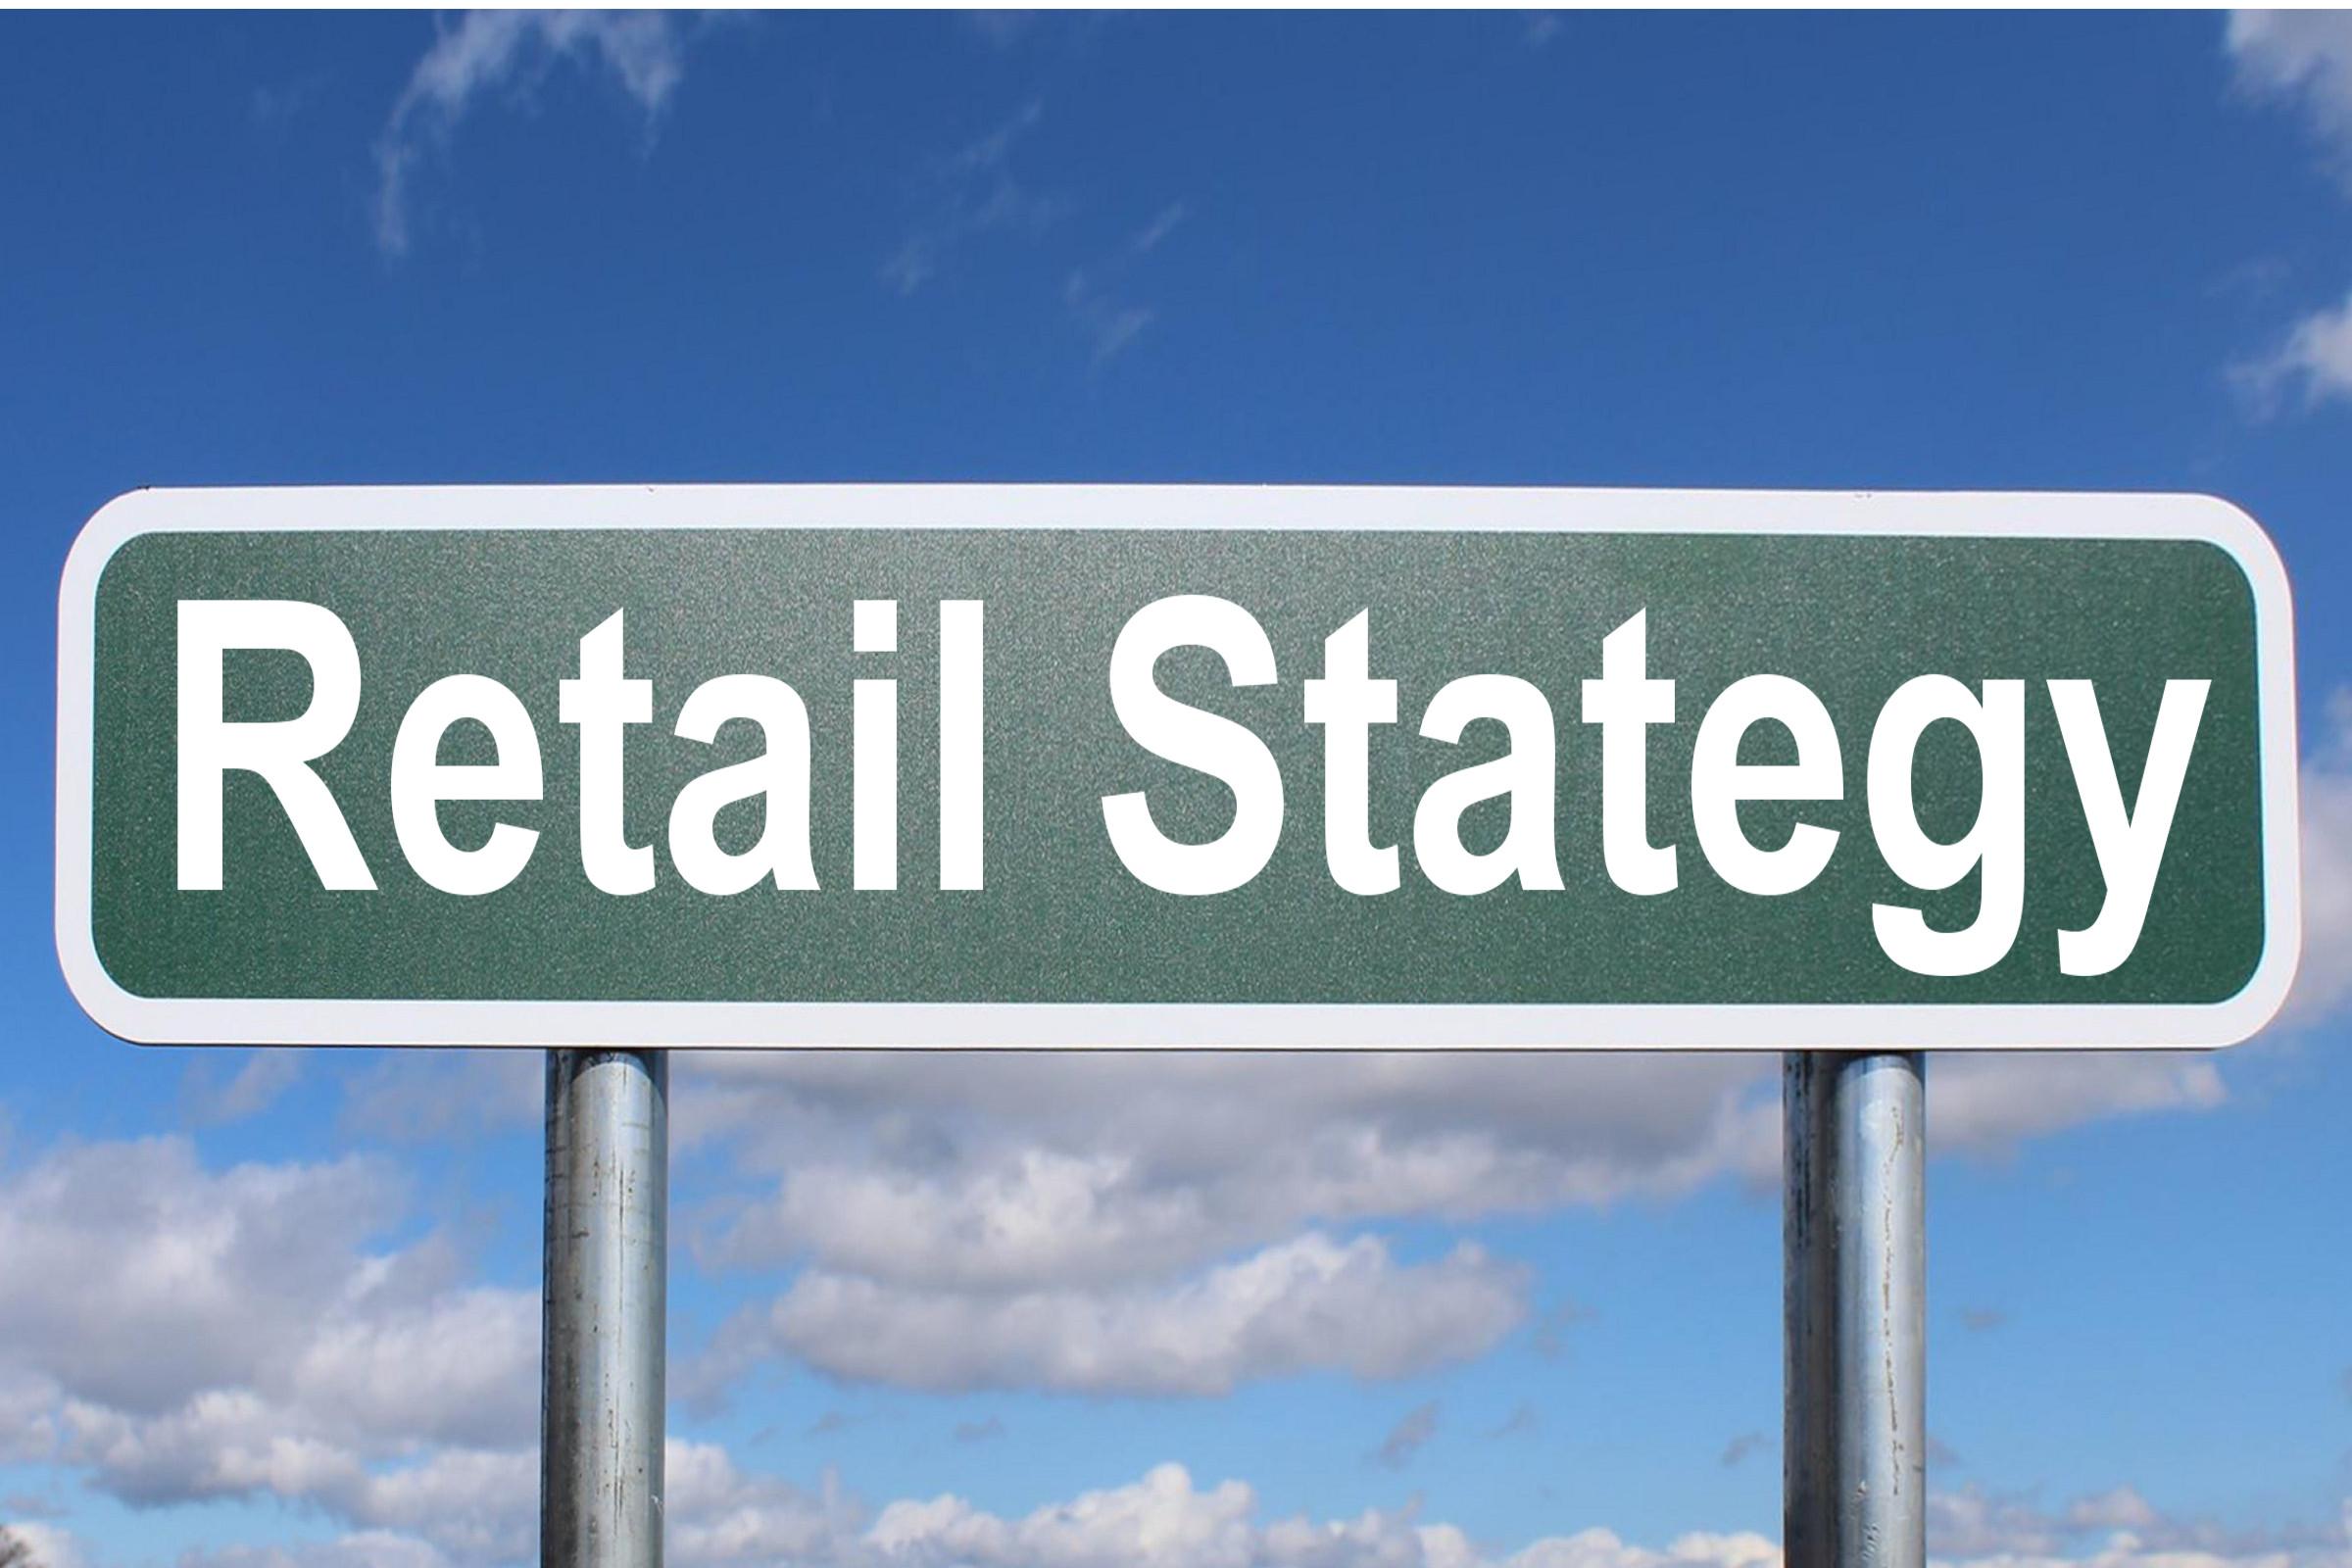 Retail Stategy